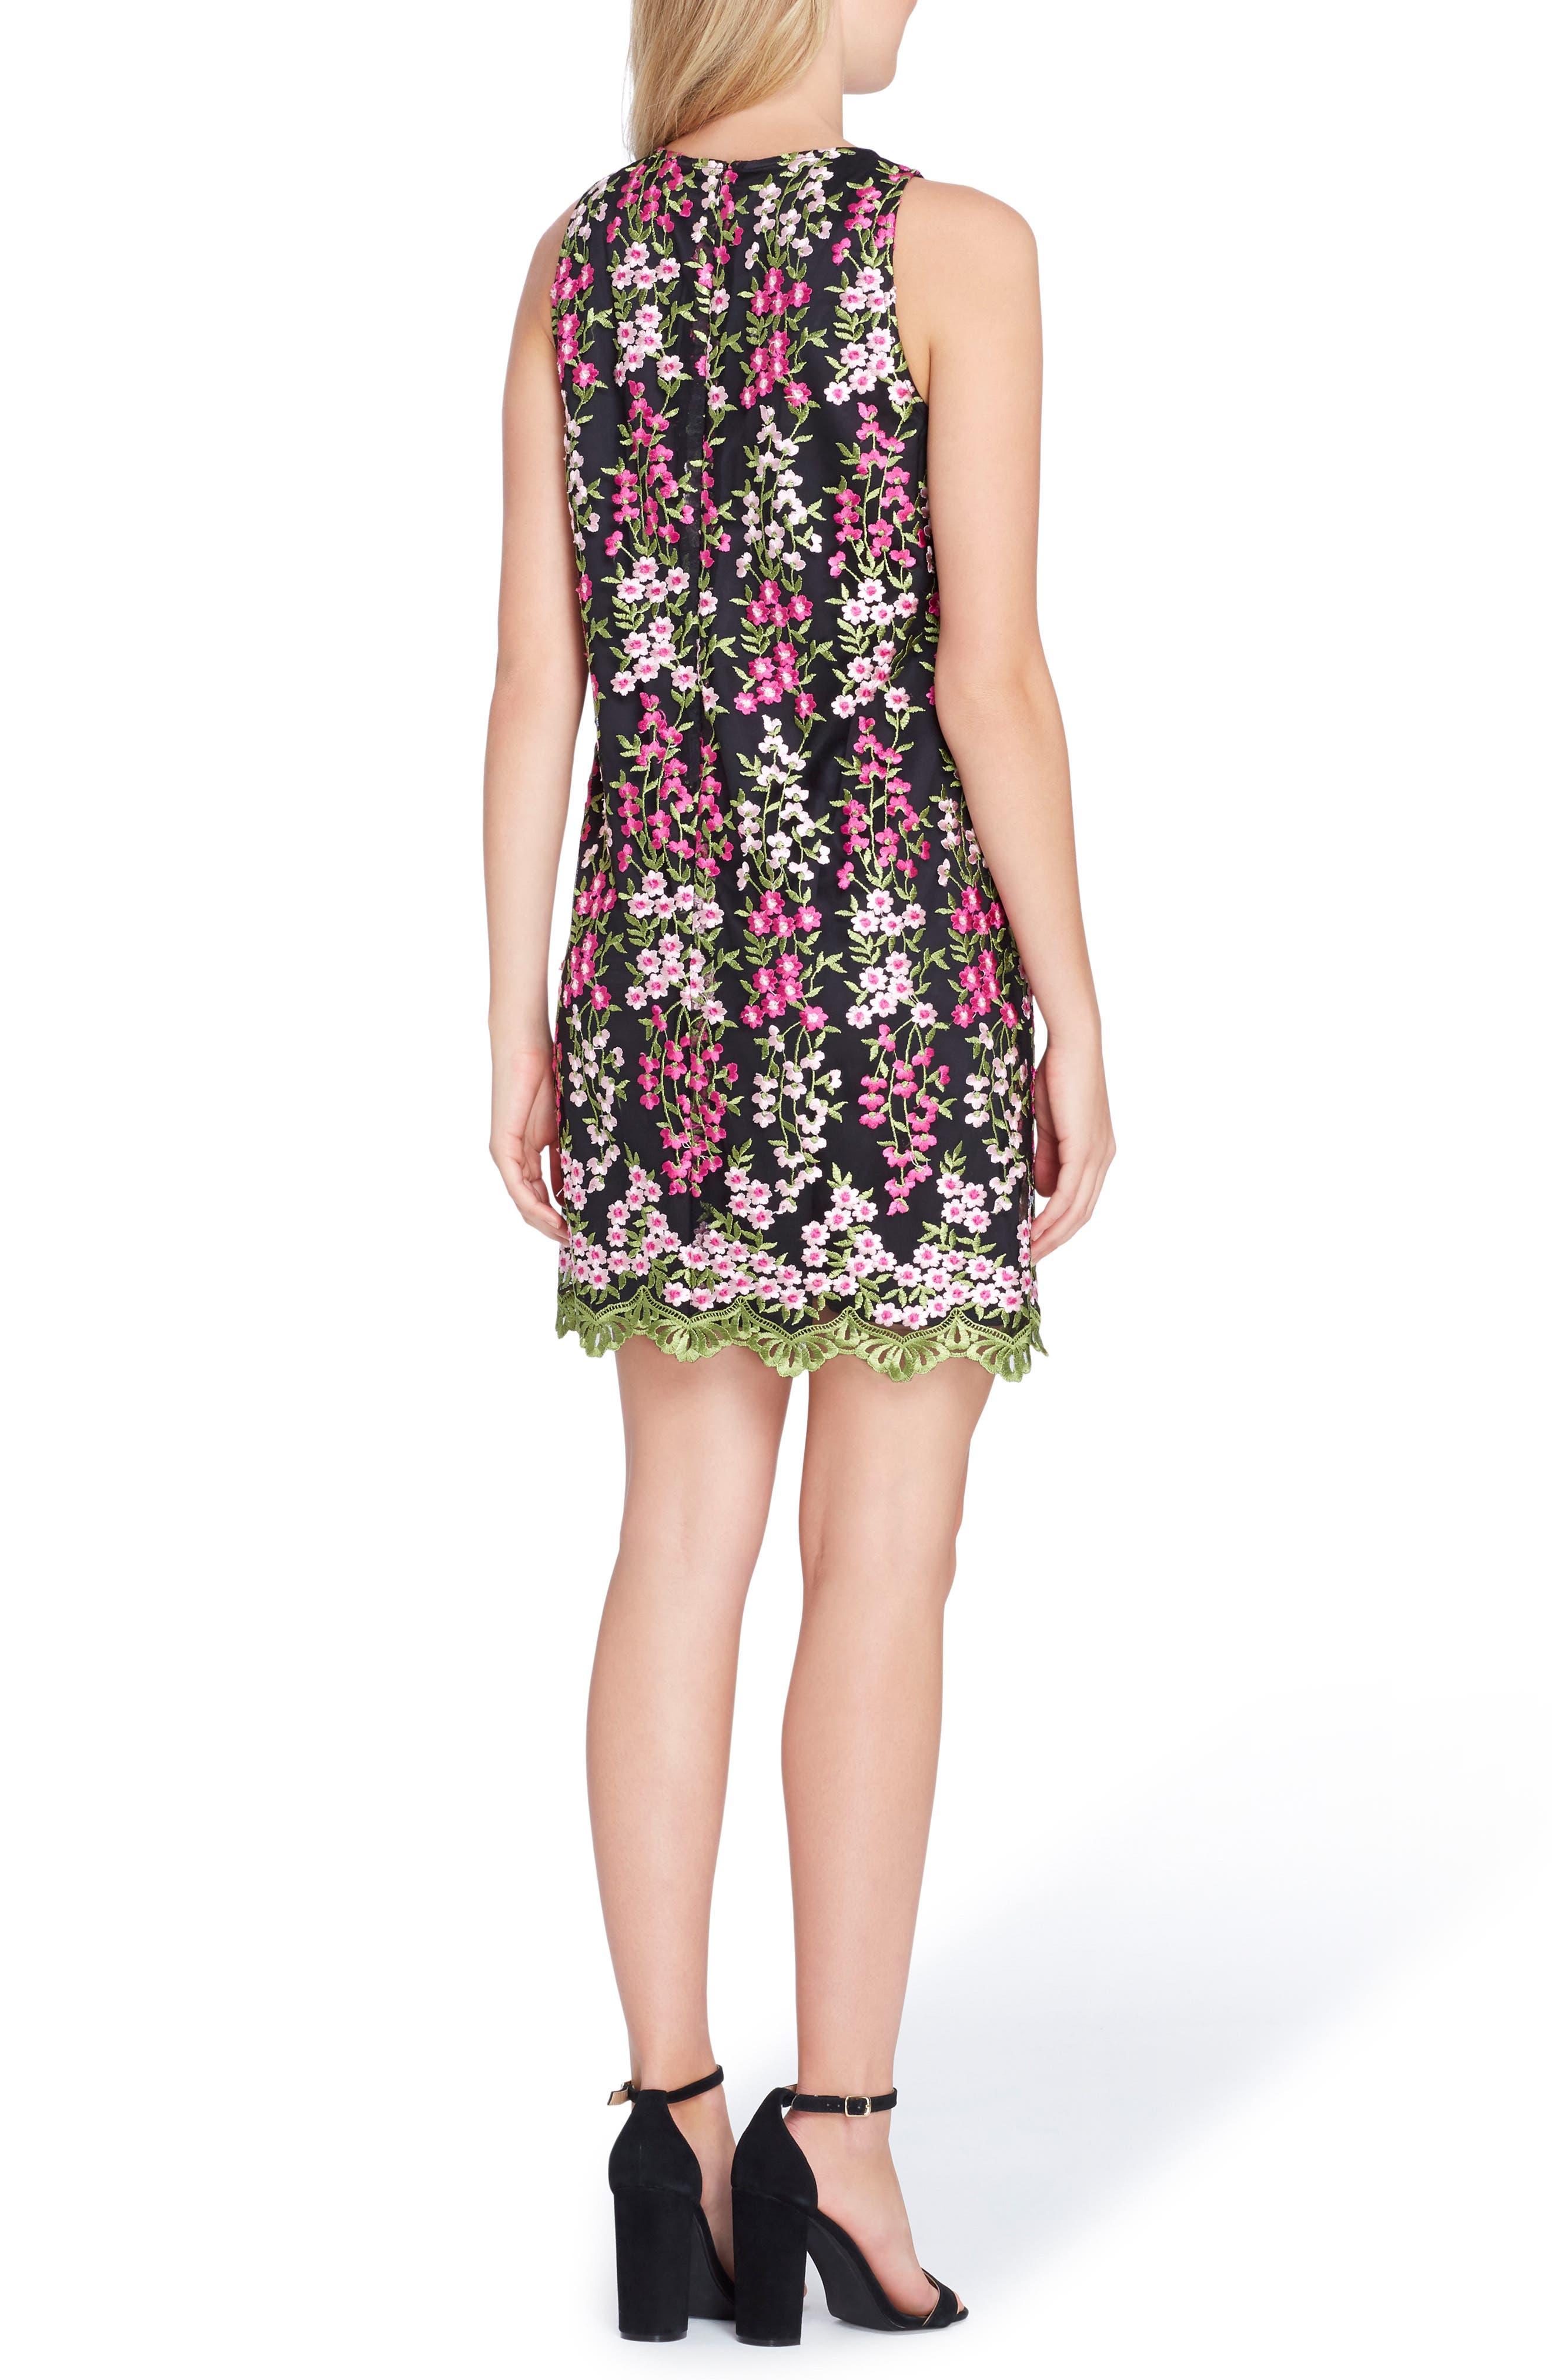 Embroidered Floral Shift Dress,                             Alternate thumbnail 2, color,                             Black/ Magenta/ Blush